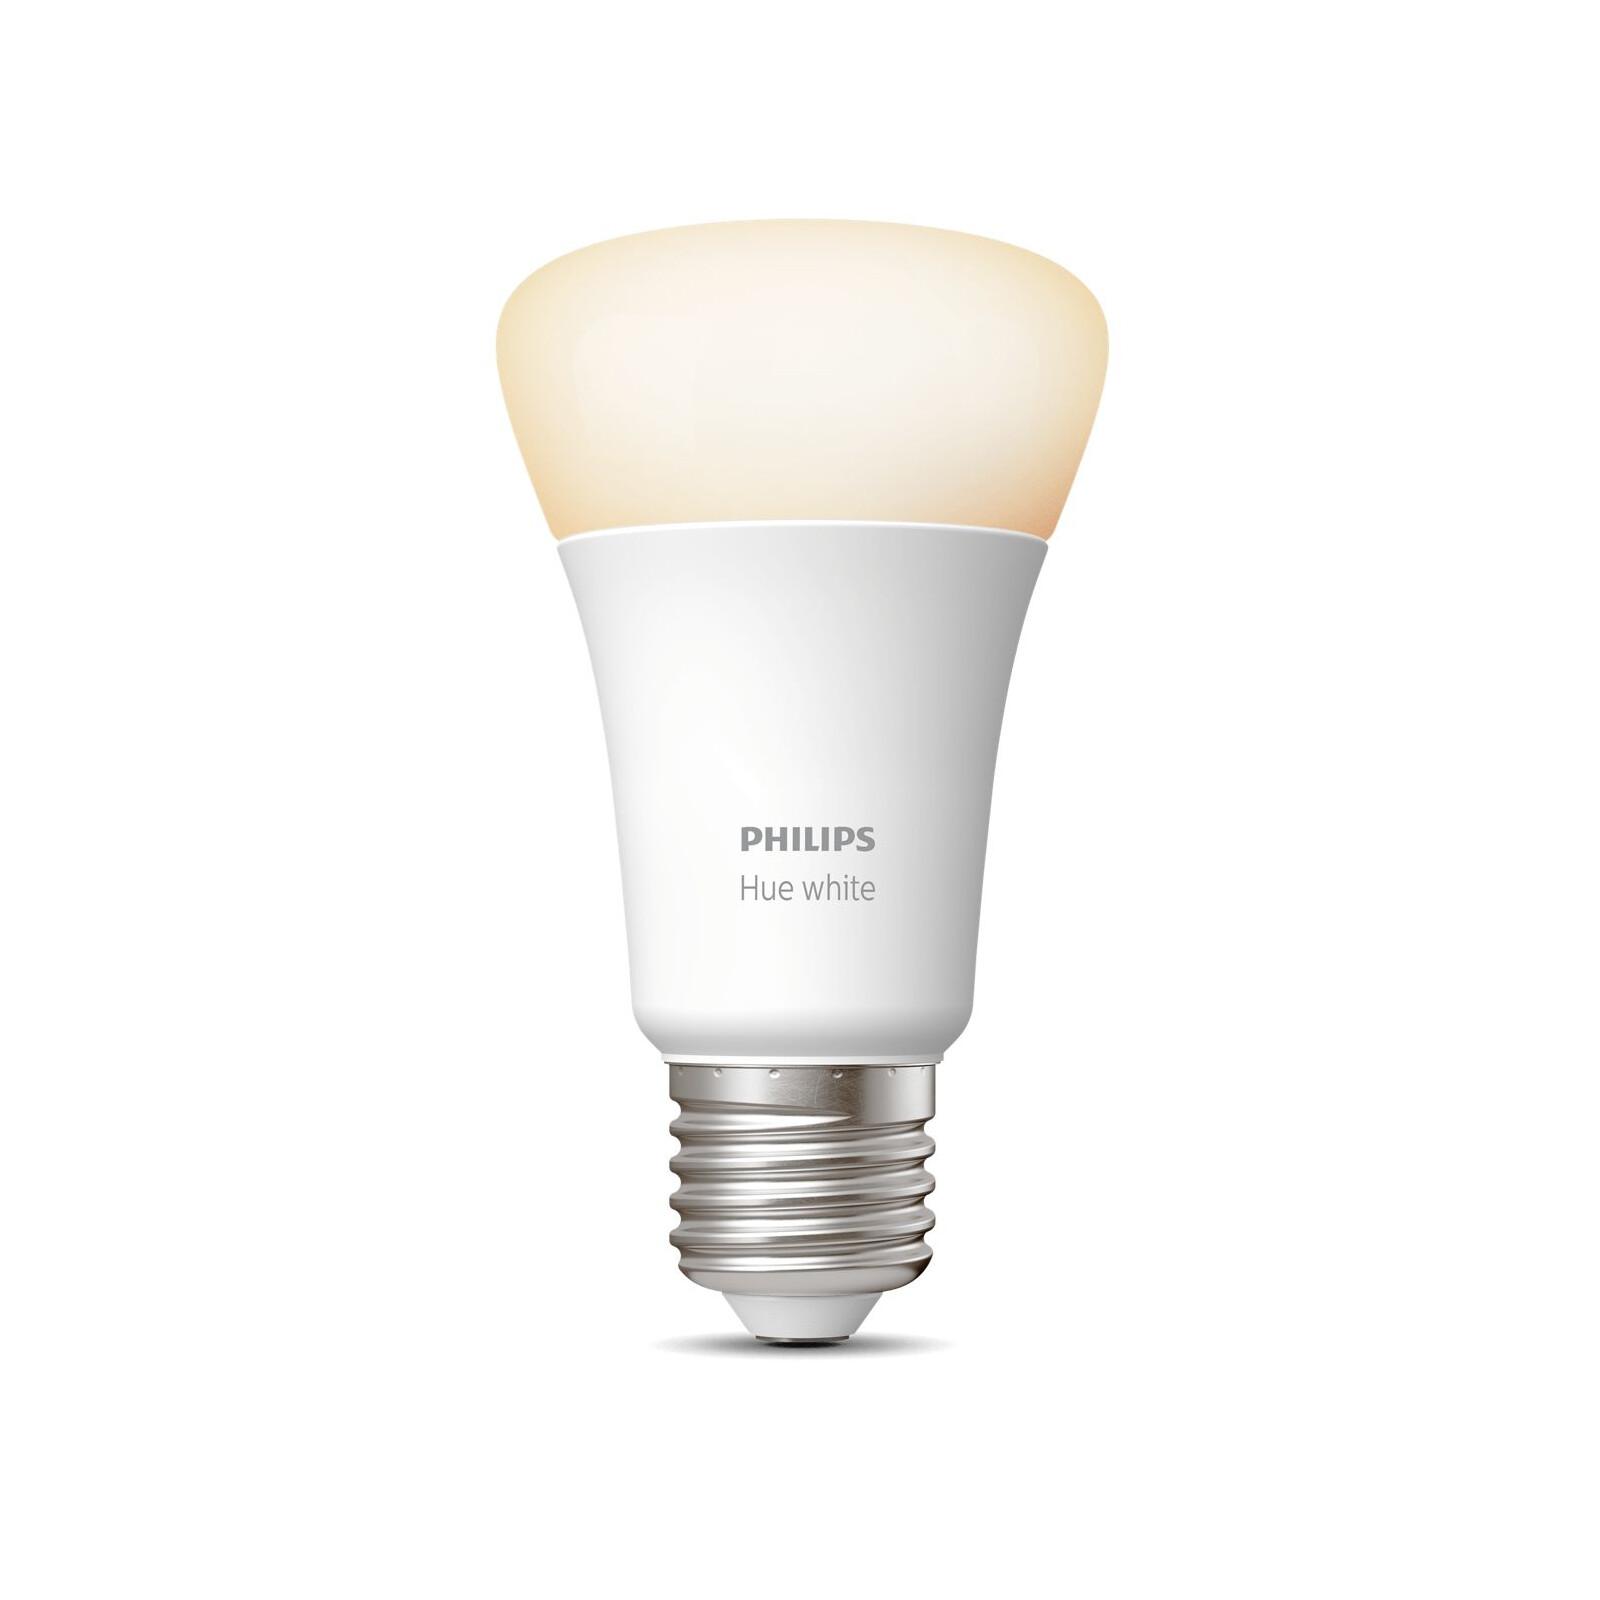 Beleuchtung Philips Hue E27 806lm Bluetooth